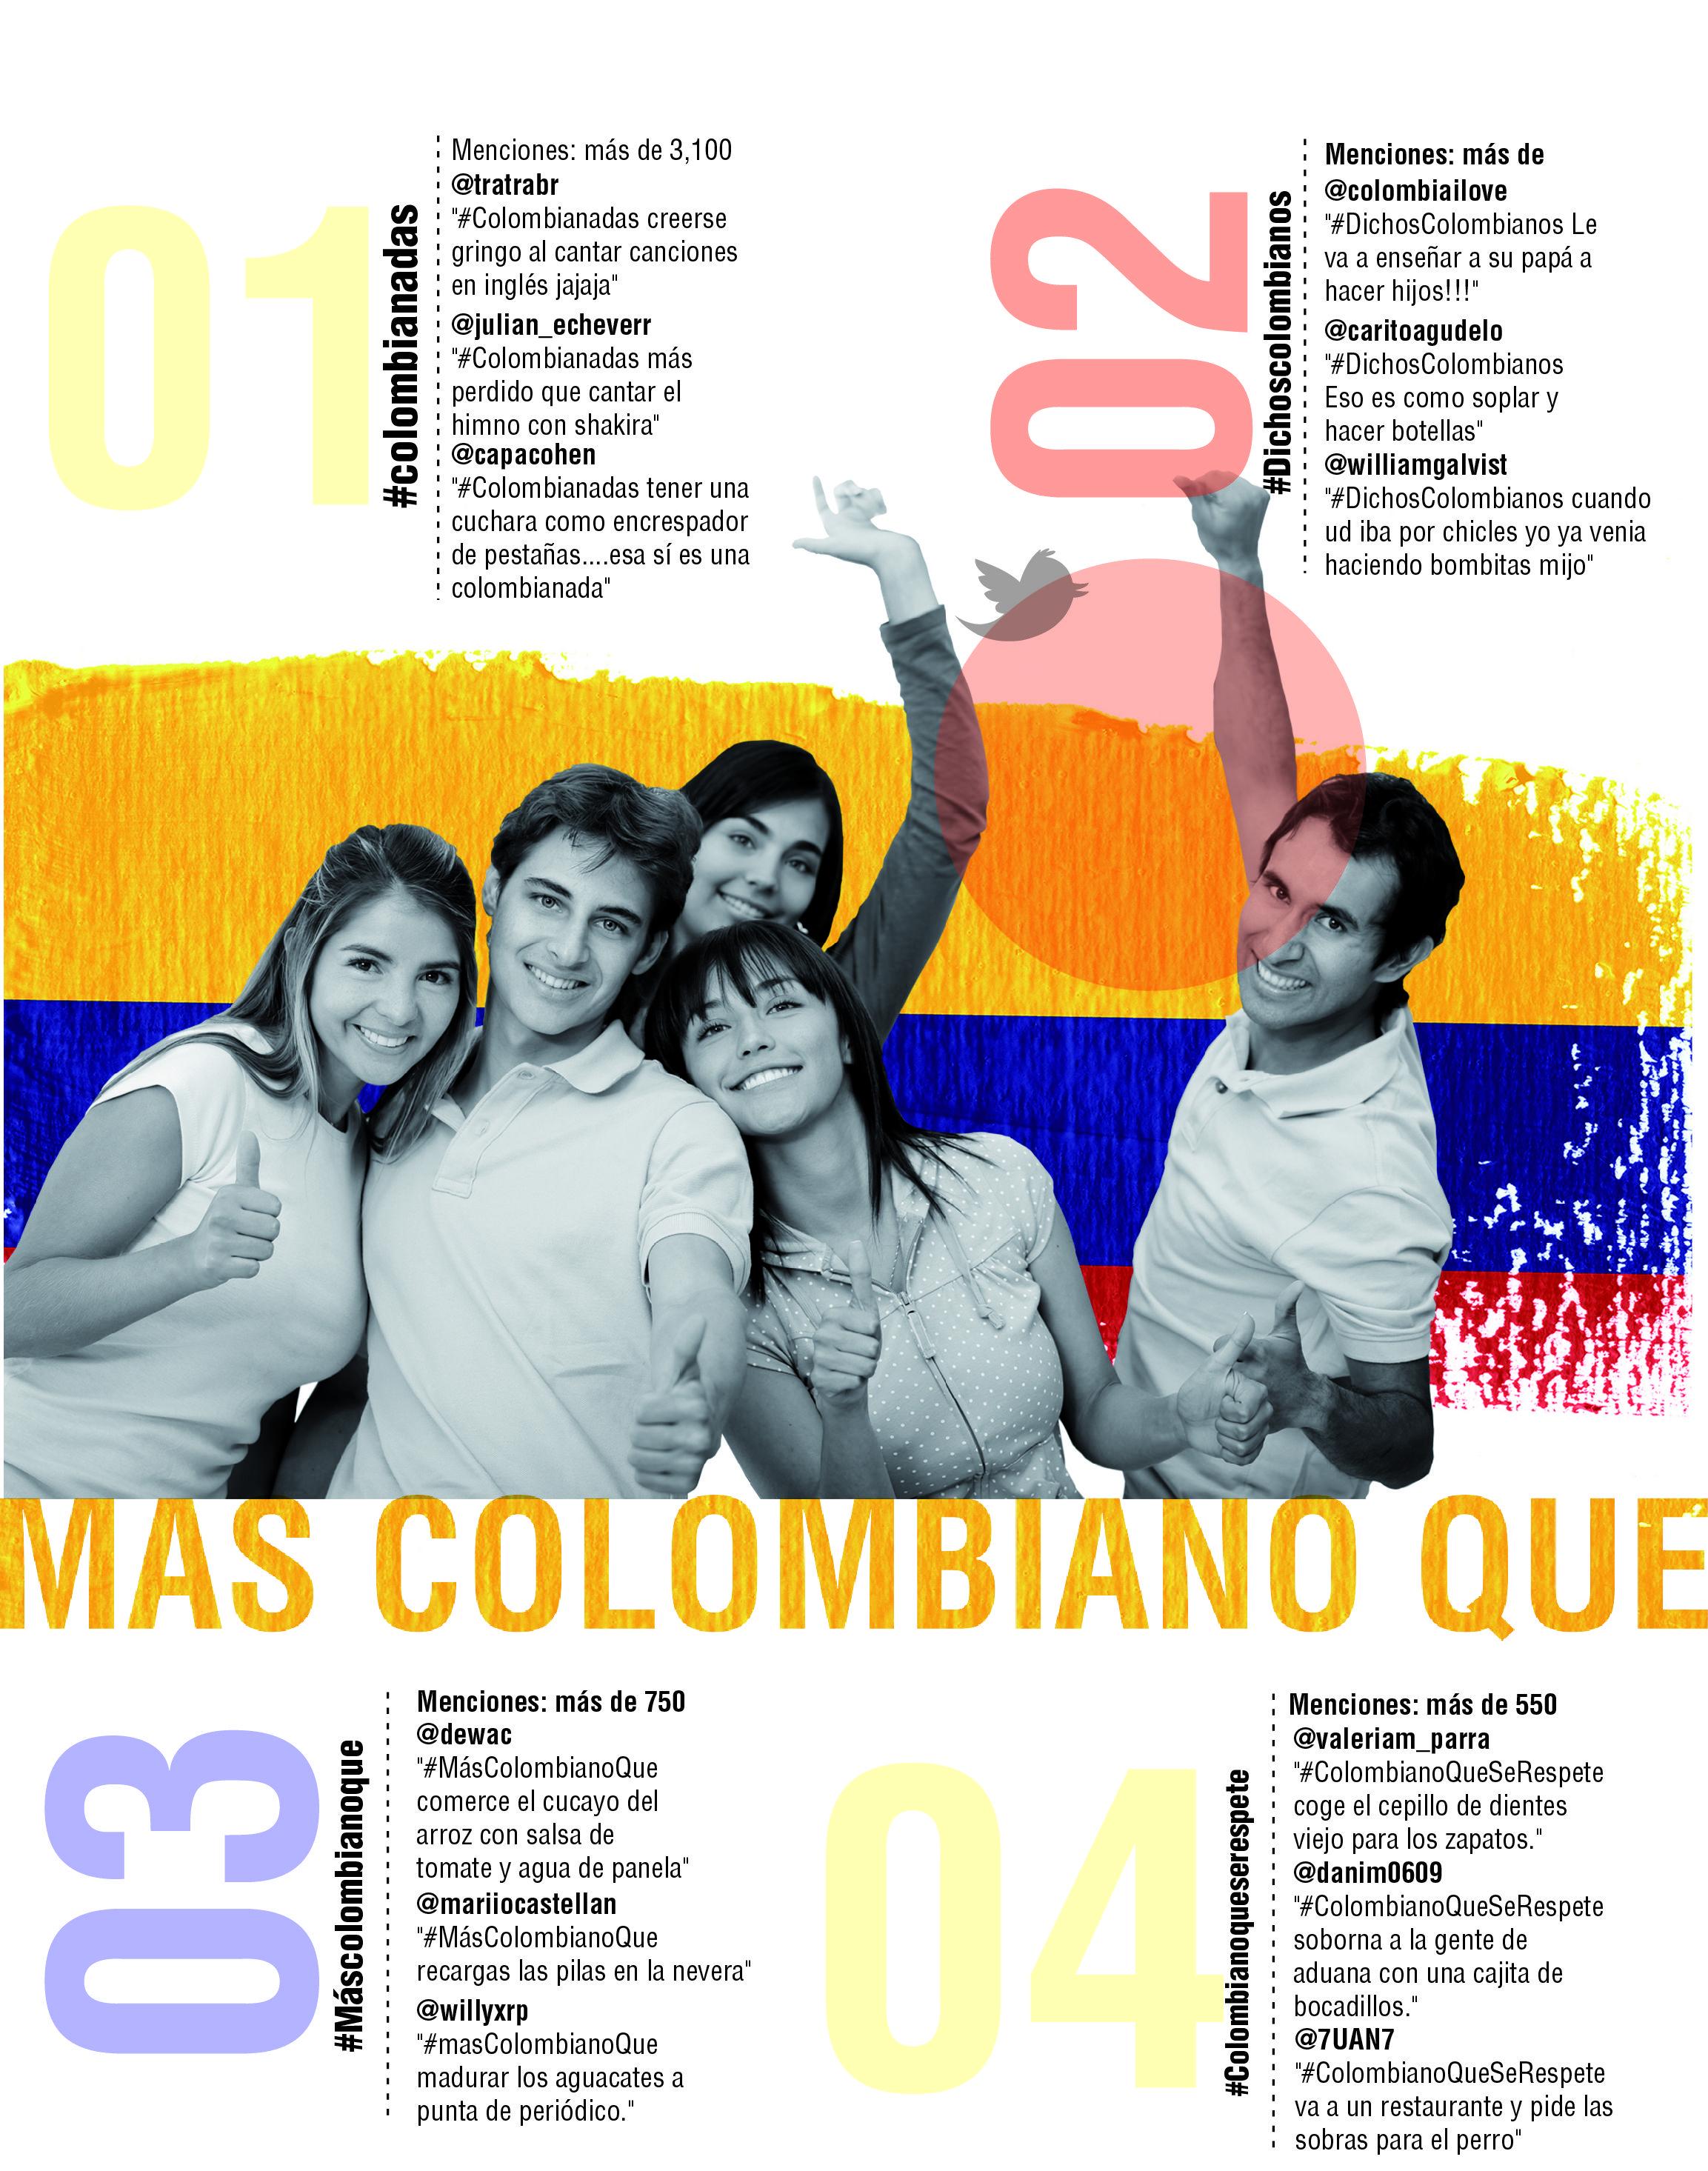 #MasColombianoQue